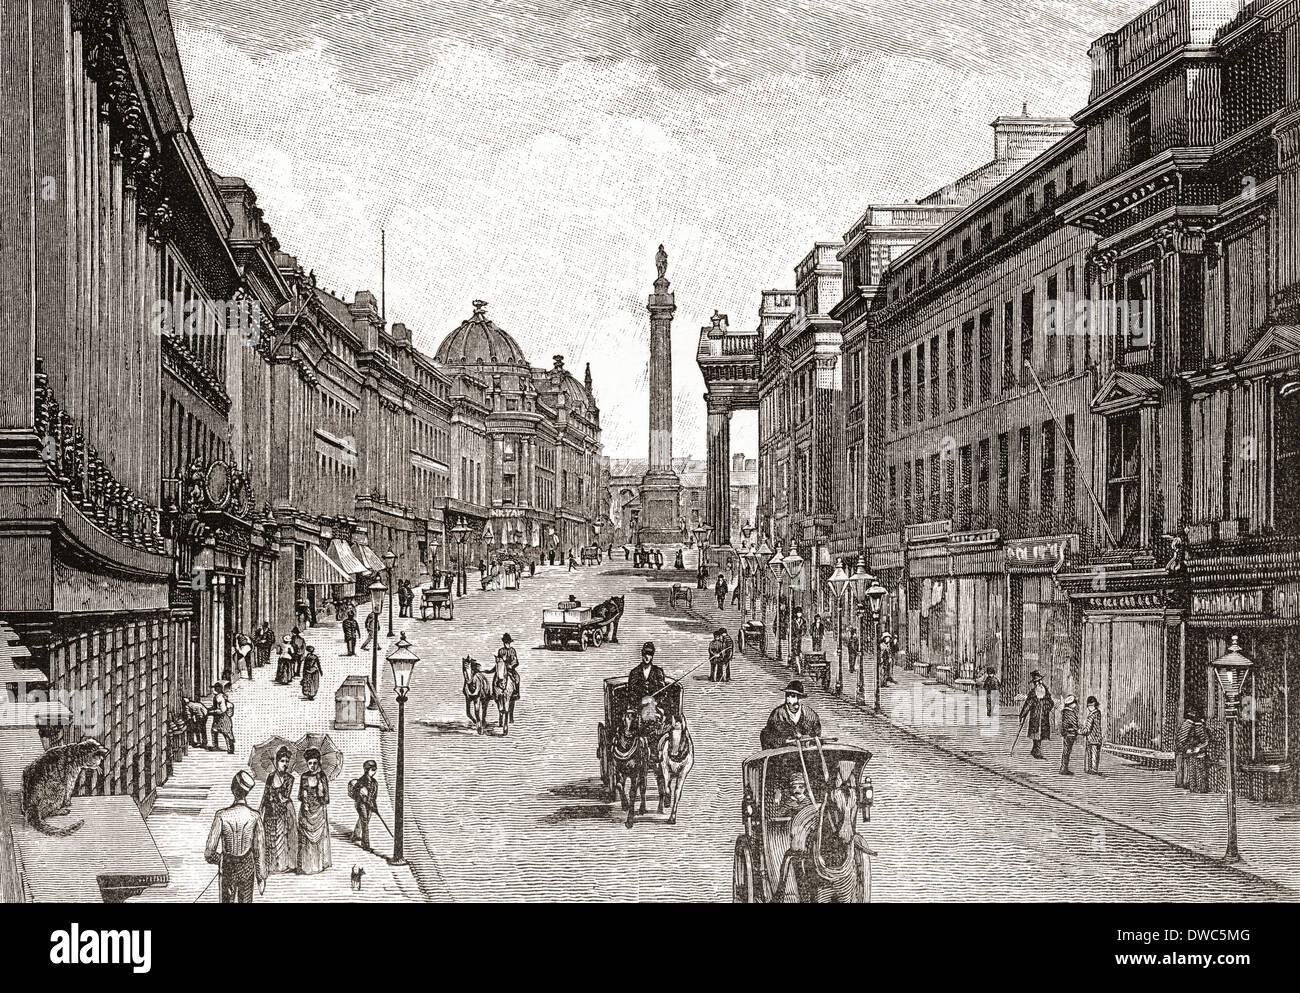 Grey Street, Newcastle-upon-Tyne, Inglaterra en el siglo XIX. Imagen De Stock